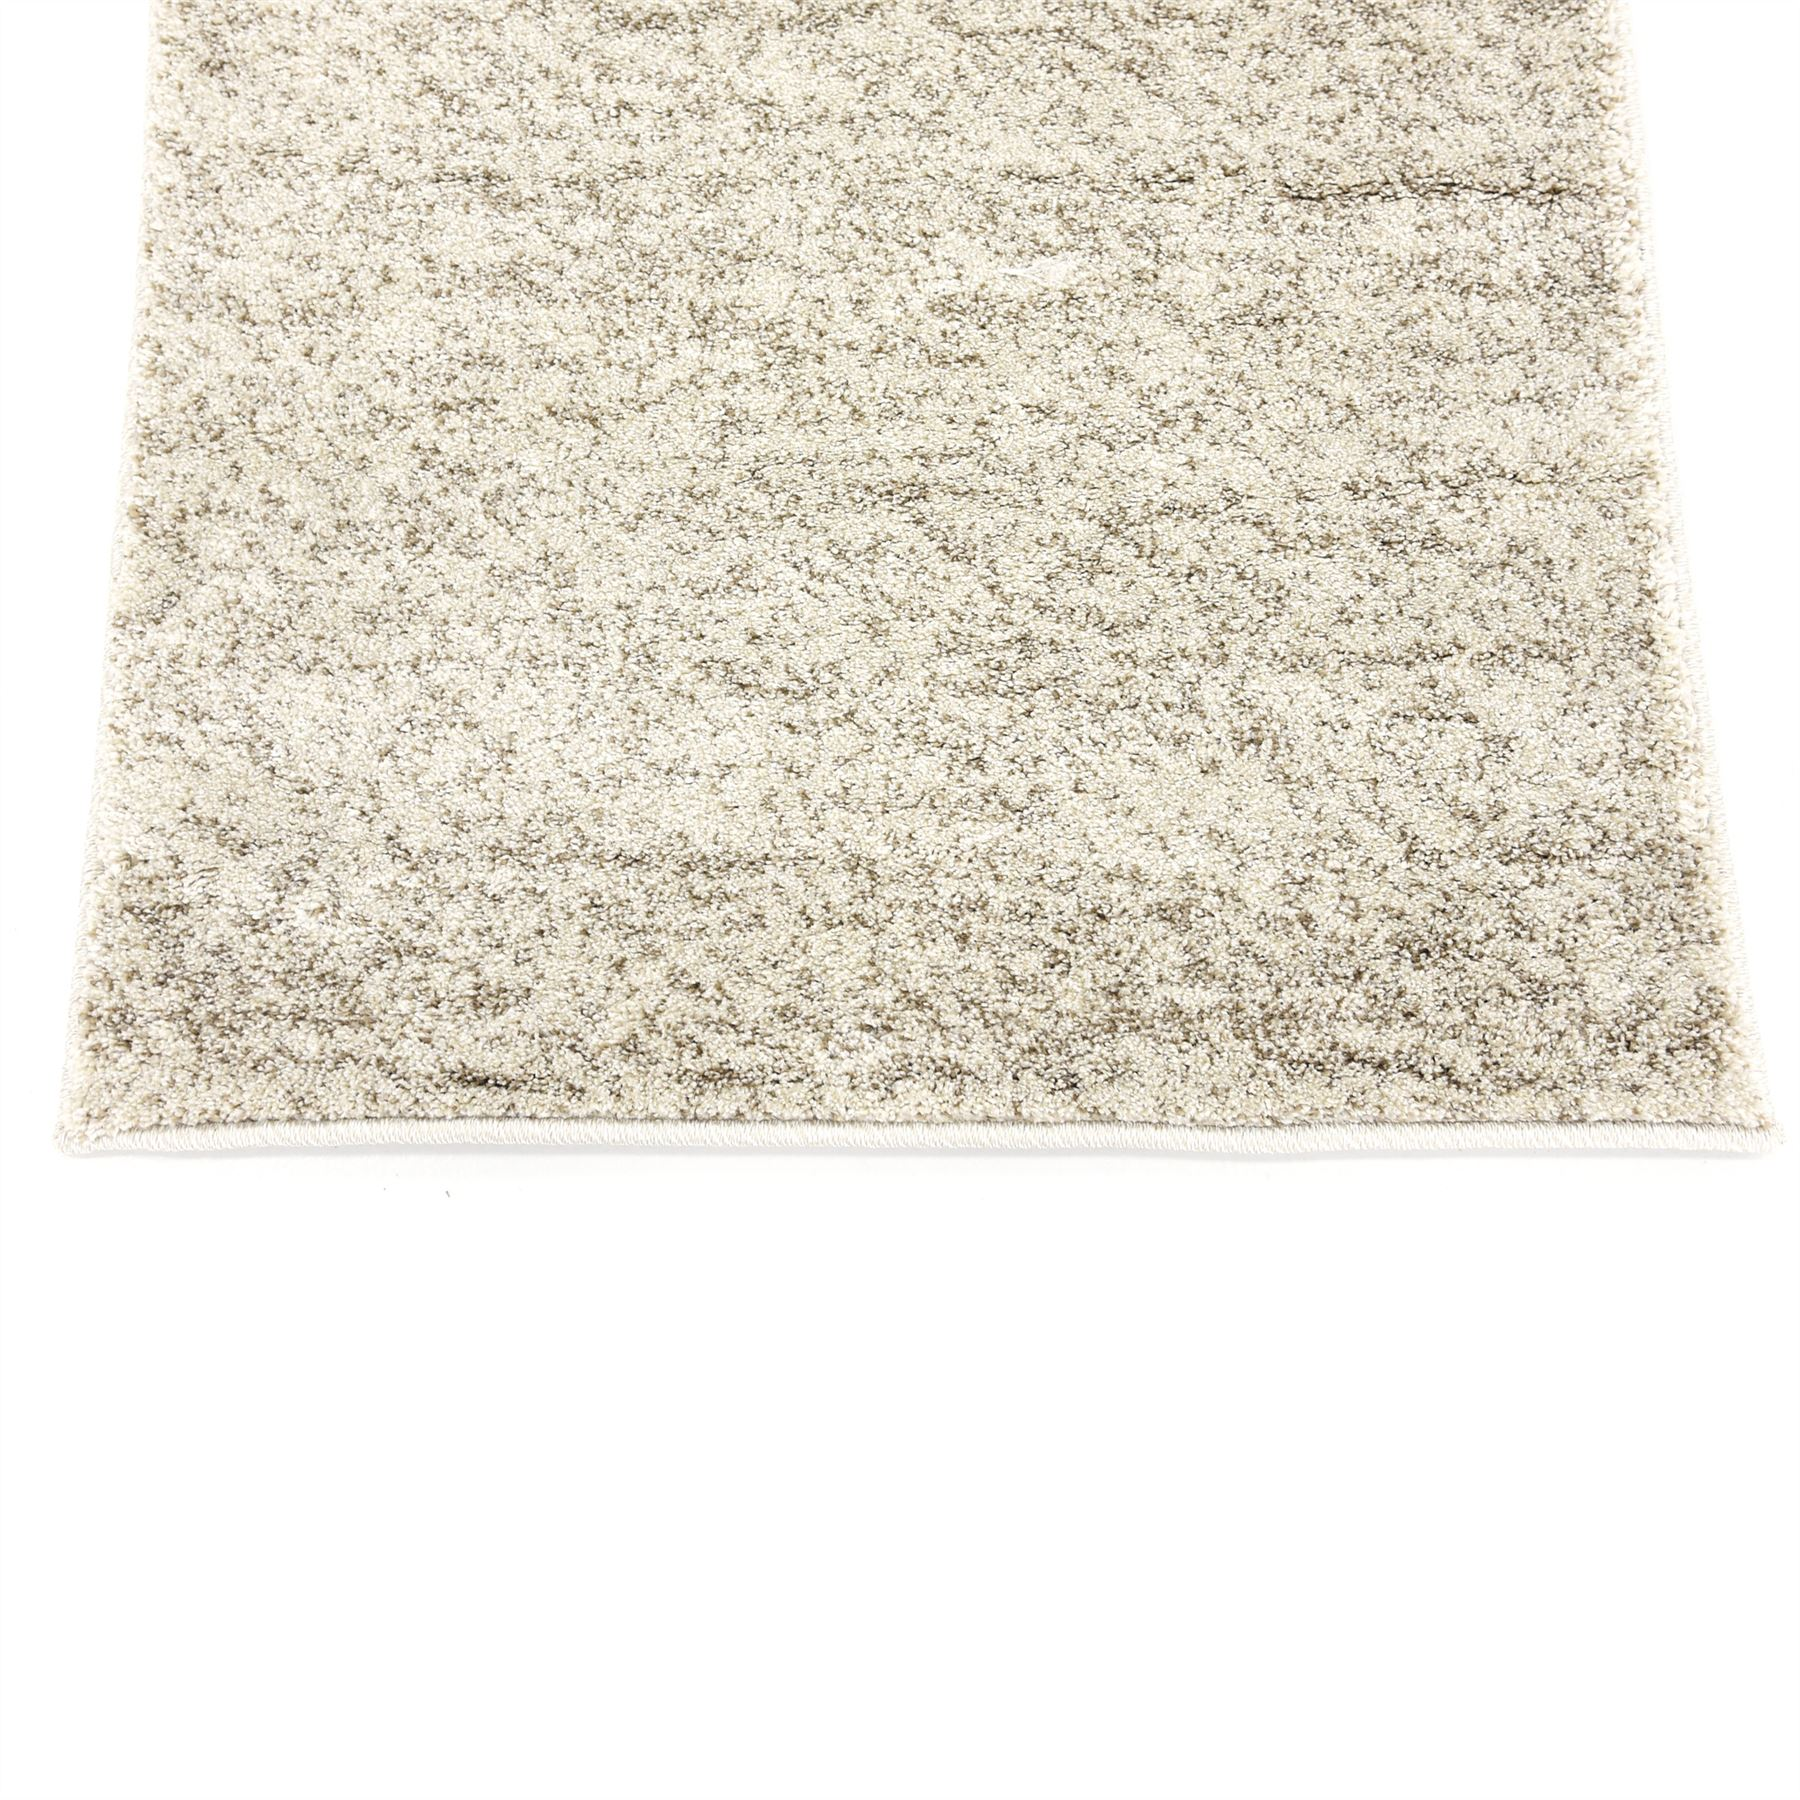 Plush Rug Floor: Soft Rug Plush Carpet Modern Solid Area Rug Floor Room